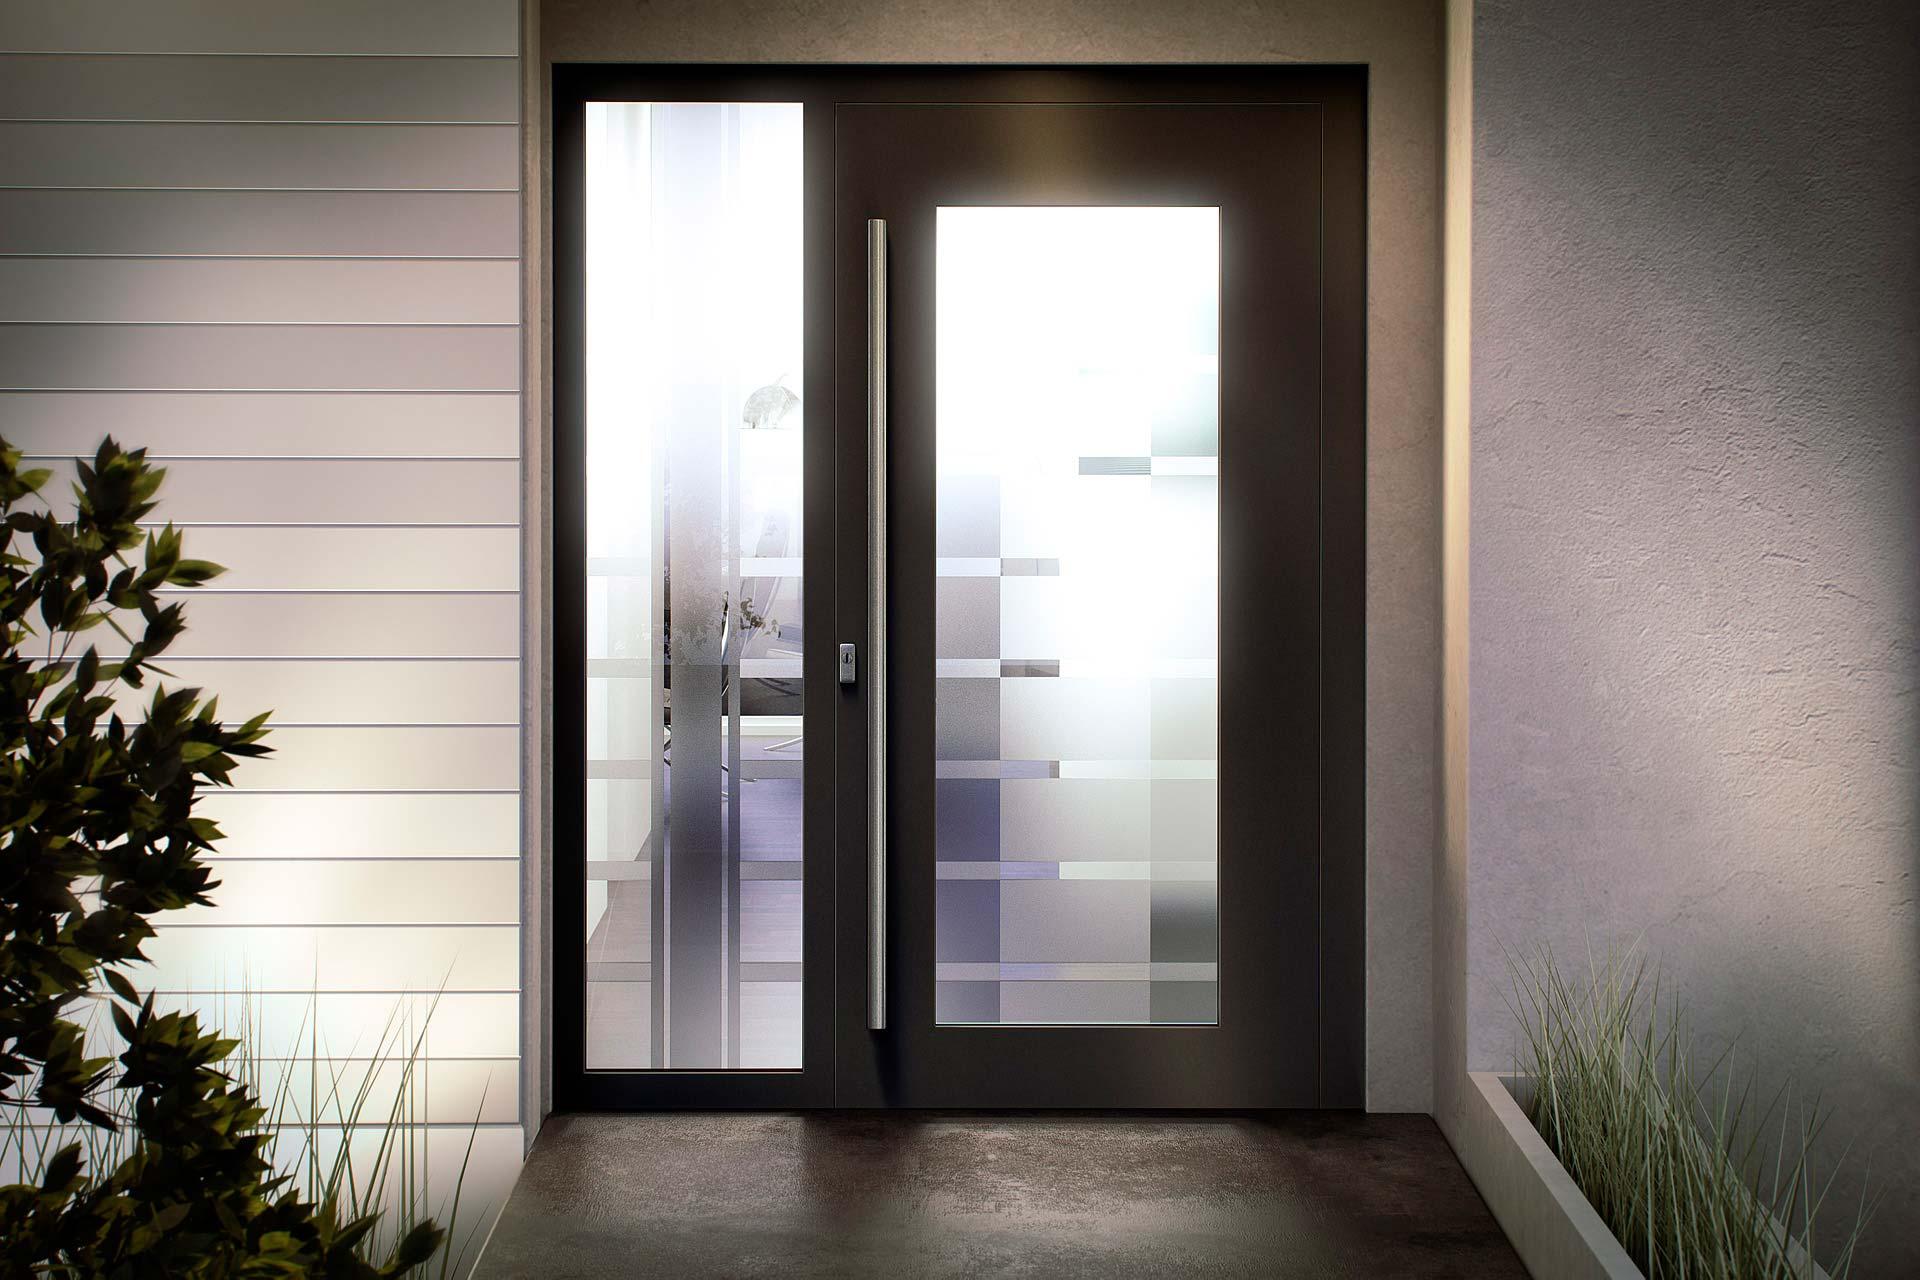 weru ag j rg br ggemann 3d und motion designer. Black Bedroom Furniture Sets. Home Design Ideas